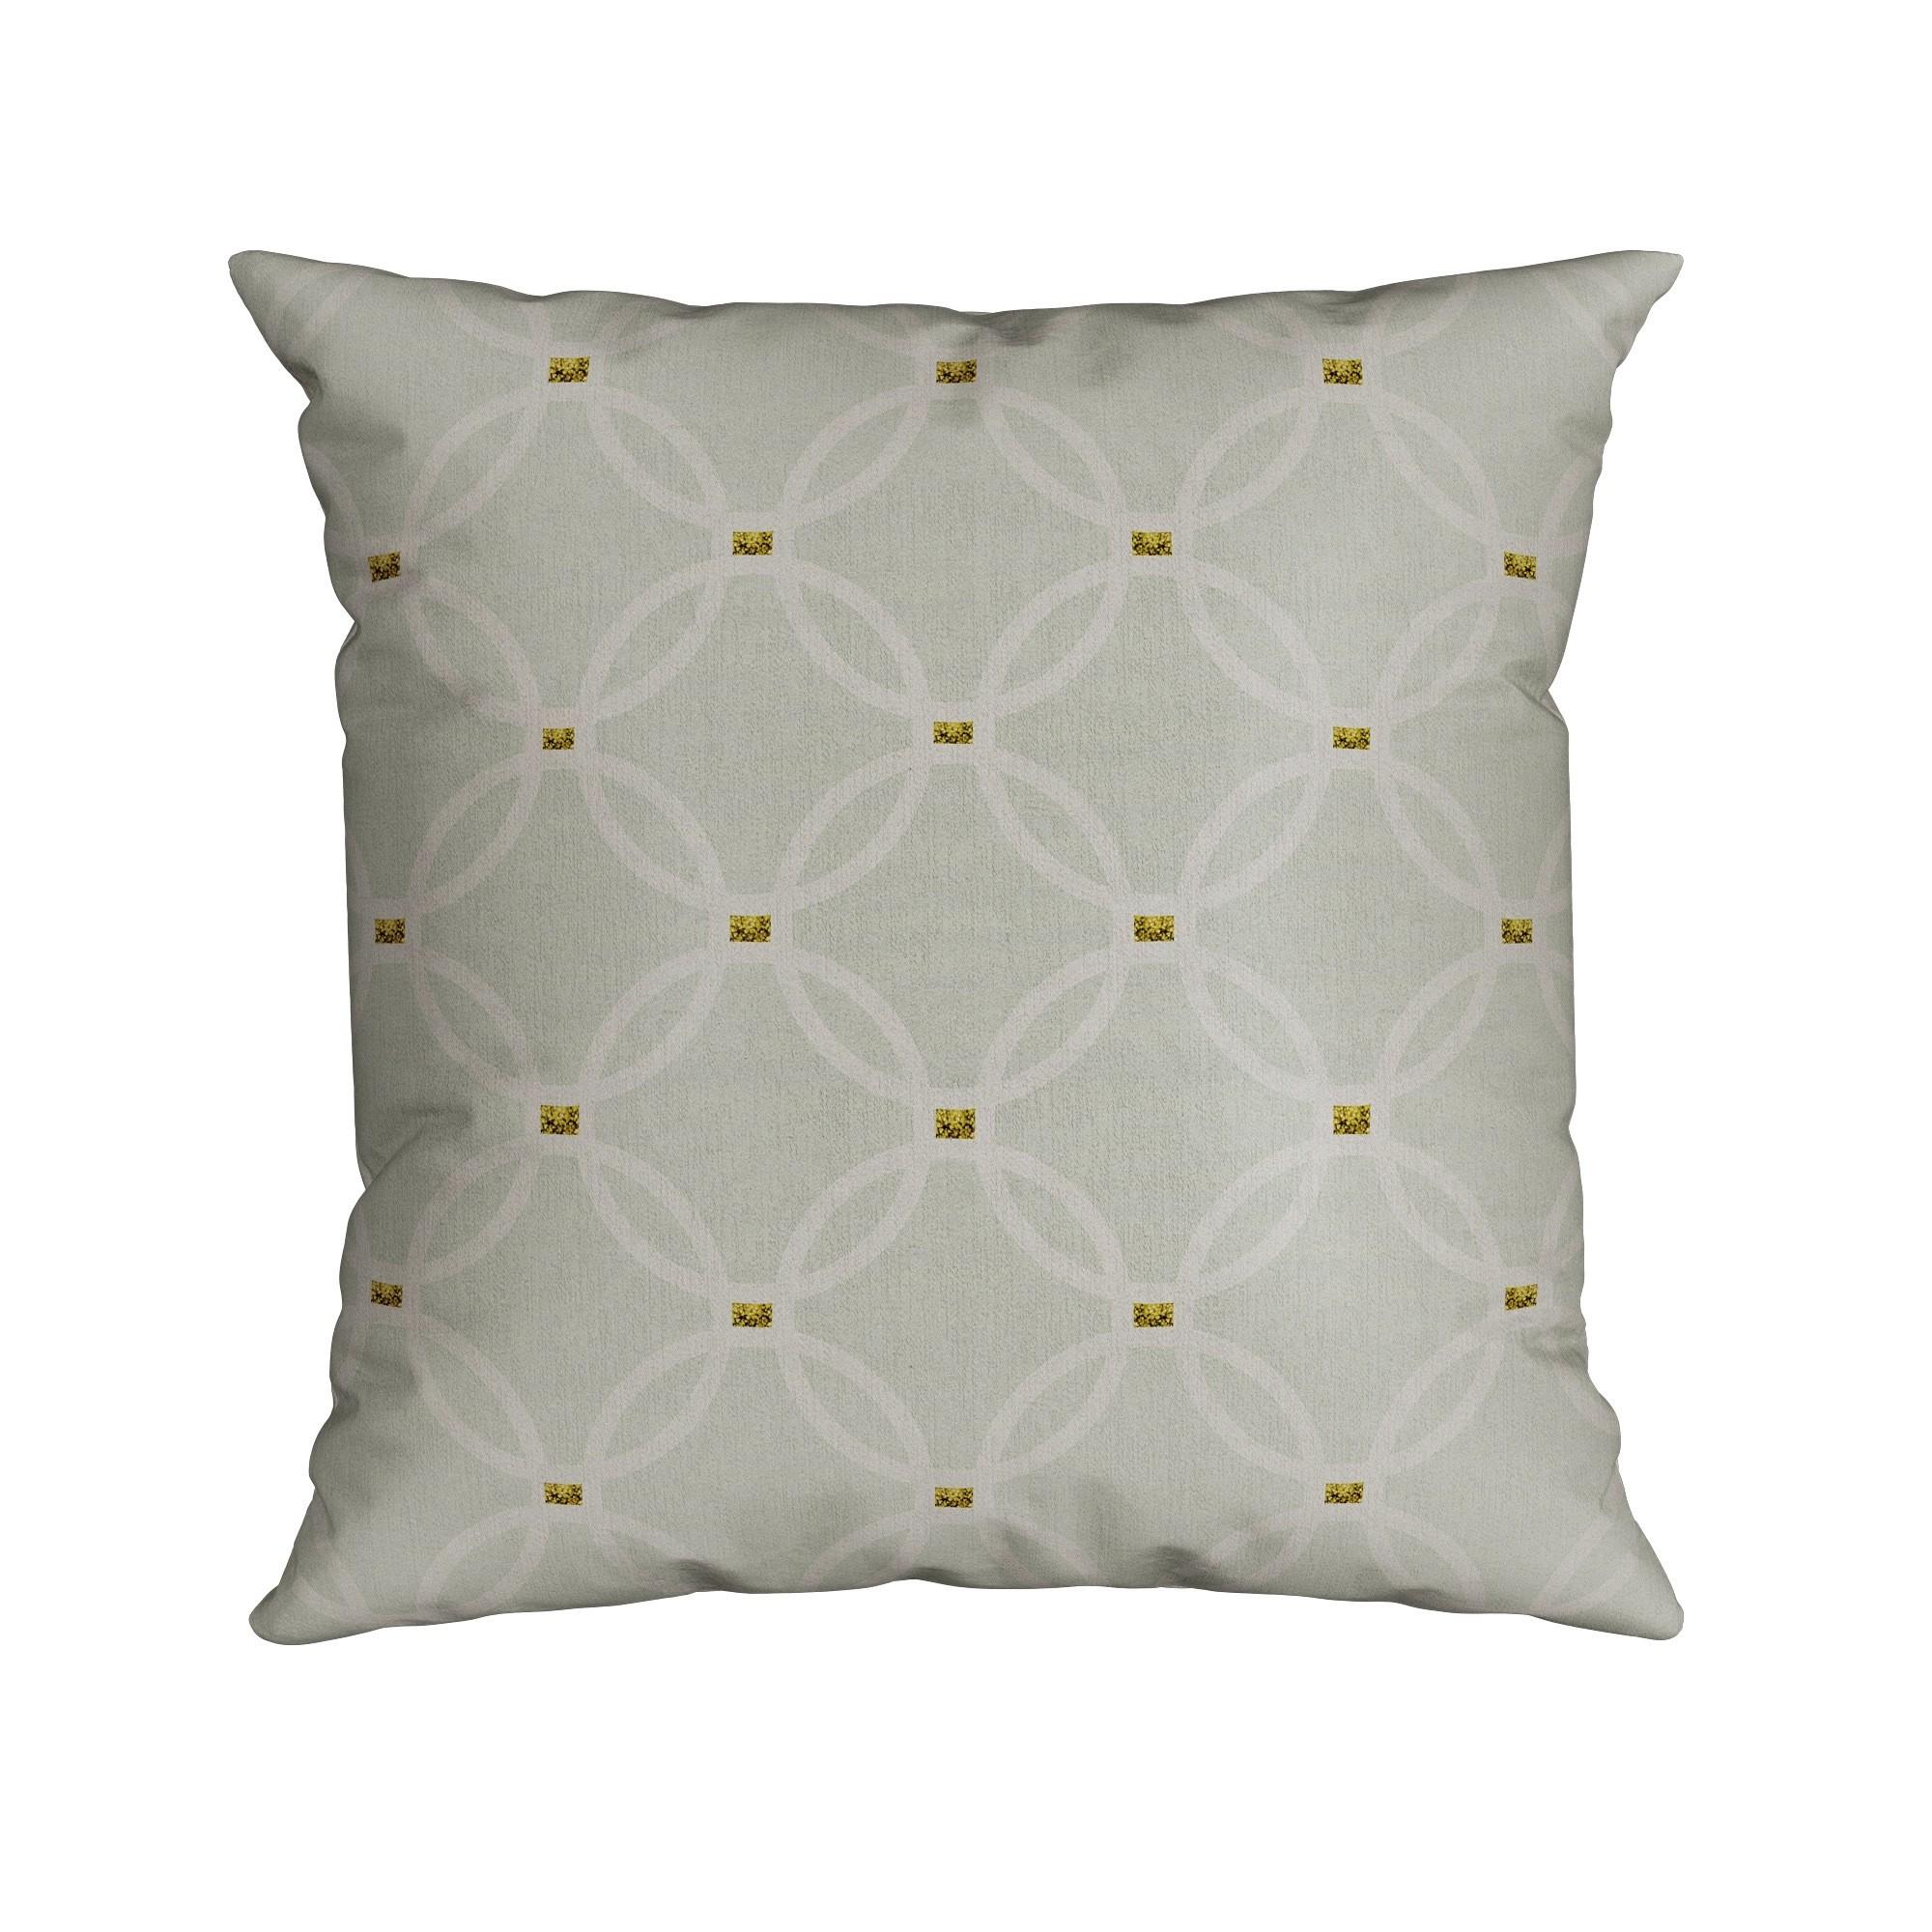 Almofada Silk Home 50x50cm 0504 - Belchior